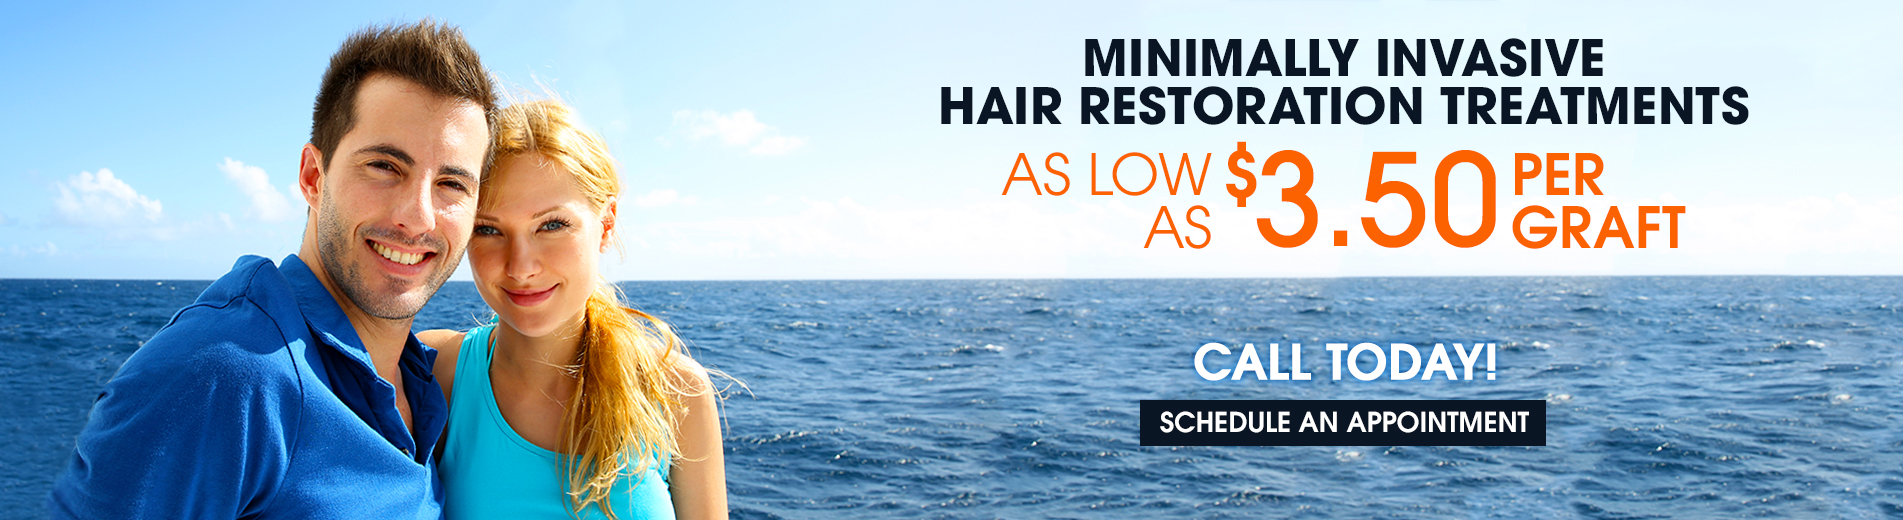 Minimally-Invasive-Hair-Restoration-Treatments